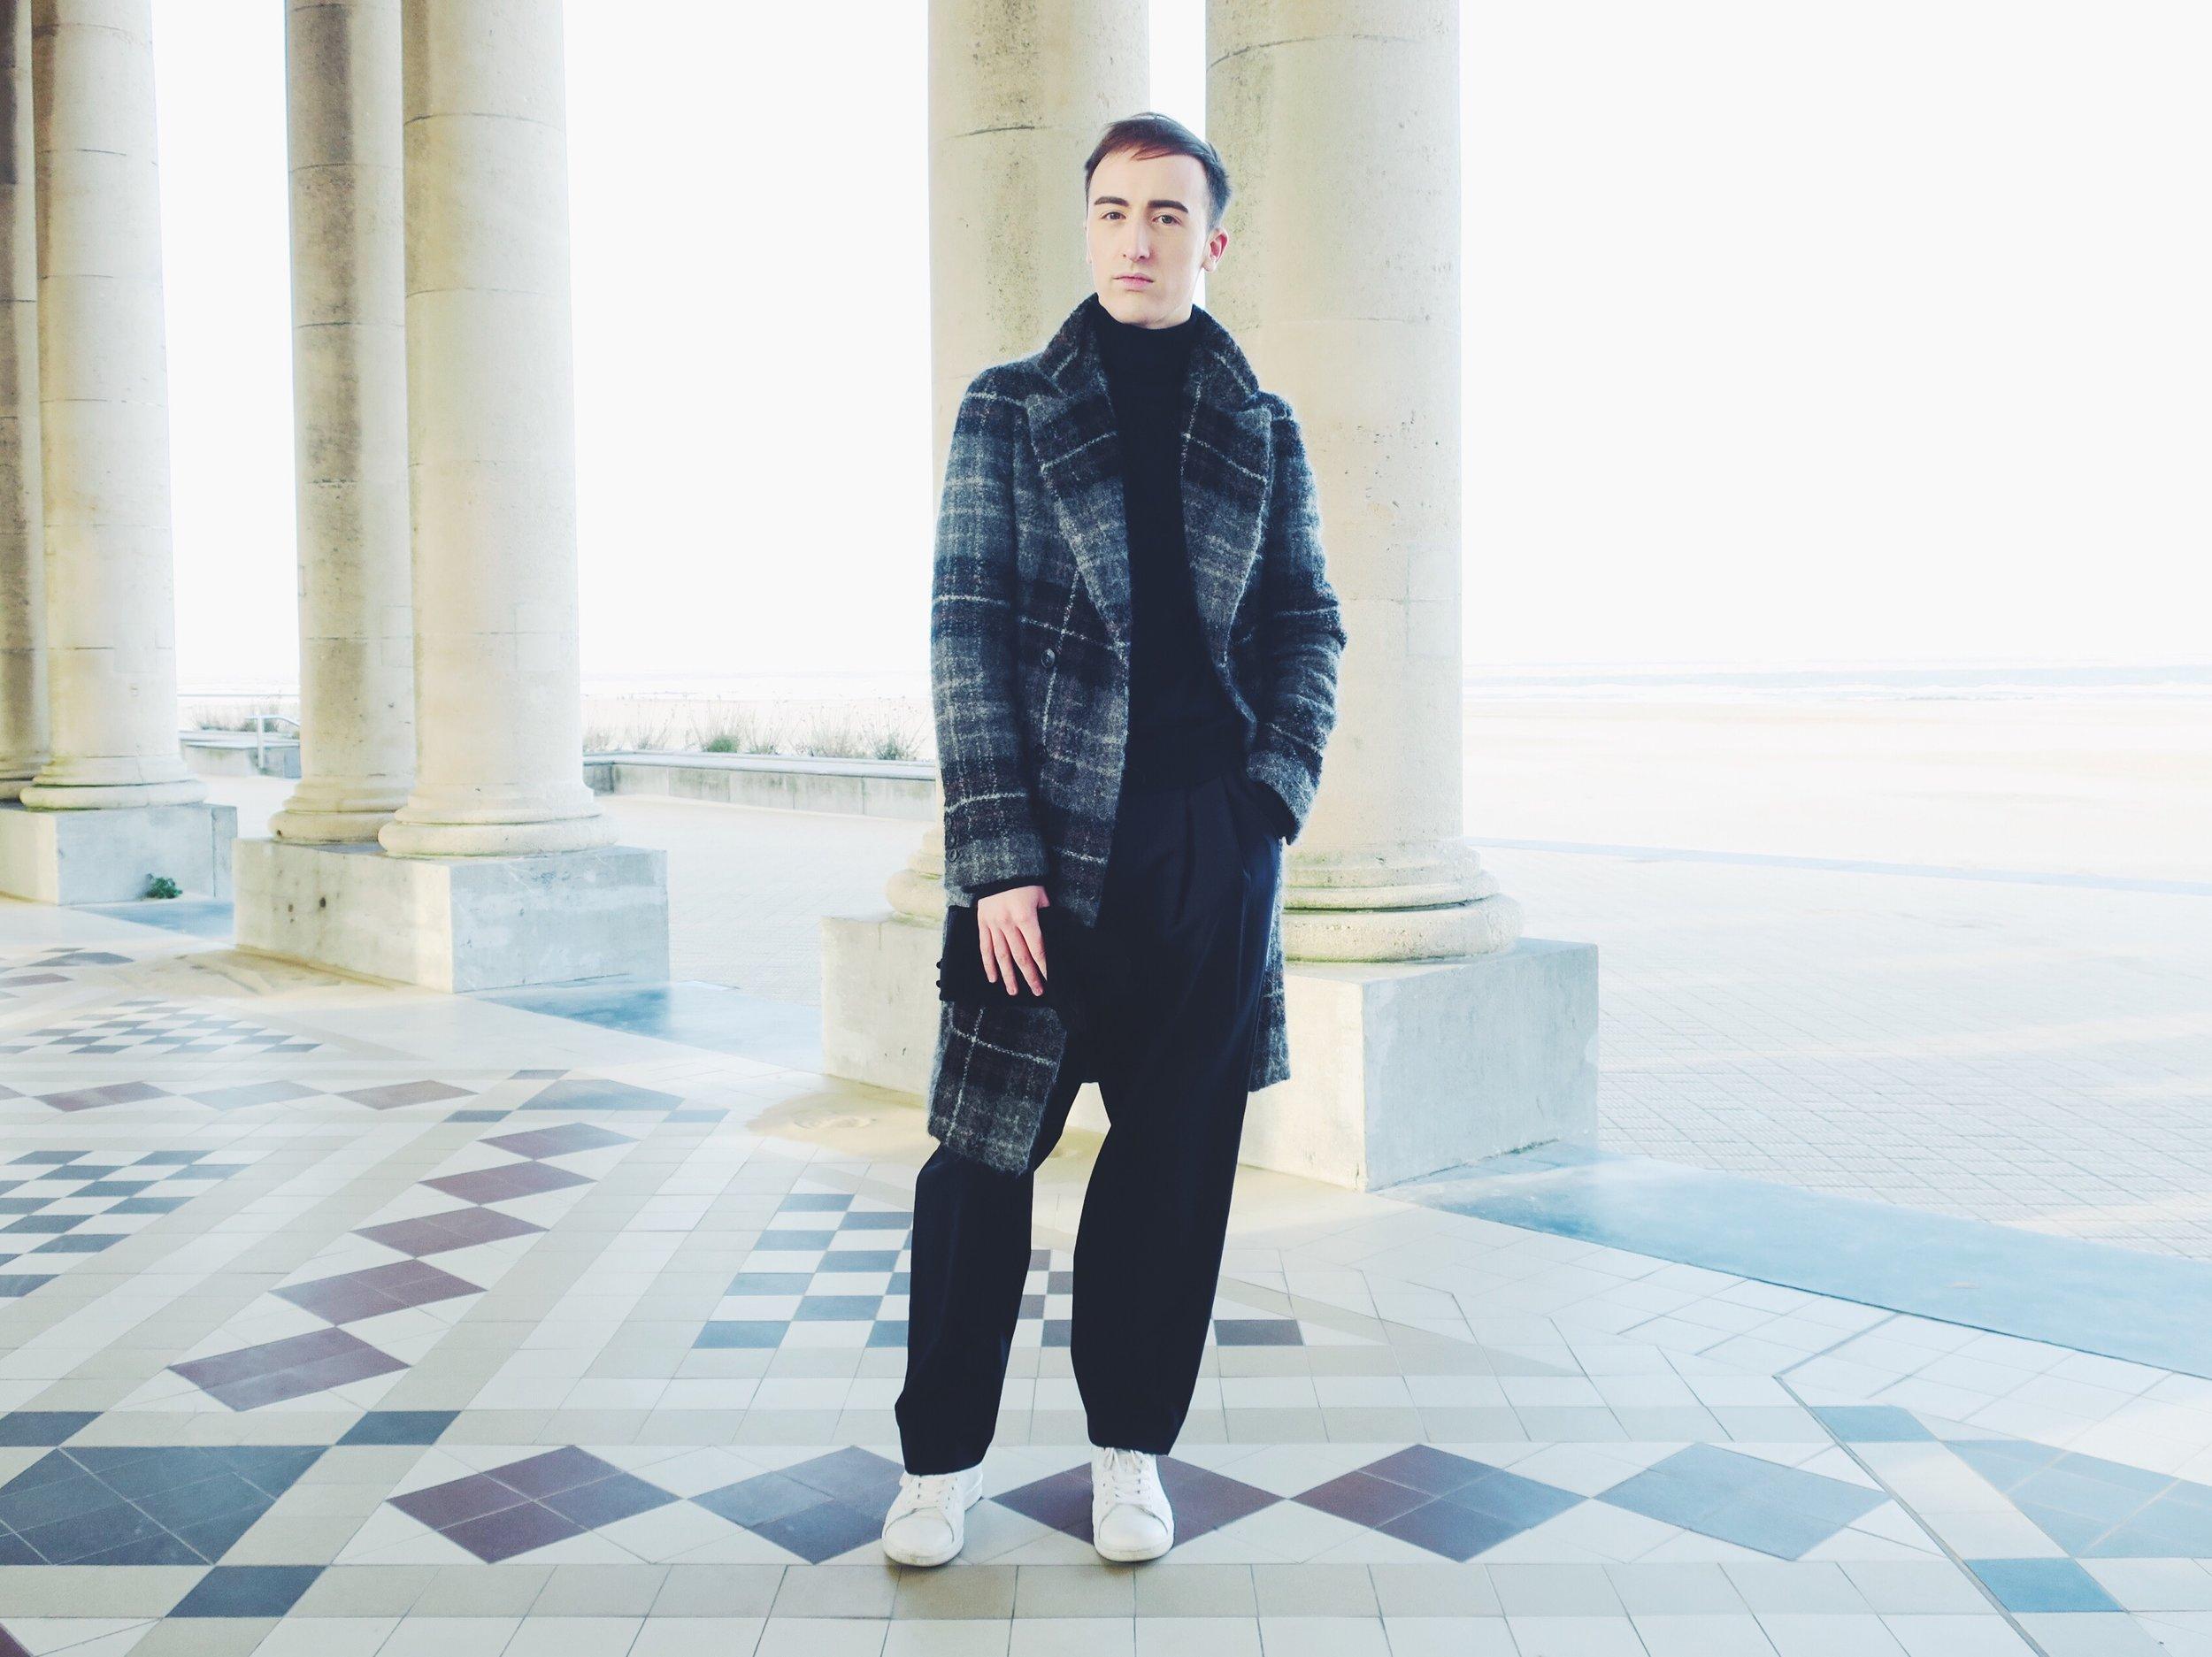 Zara coat - Arket turtleneck - Zara trousers - Adidas Stan Smith sneakers